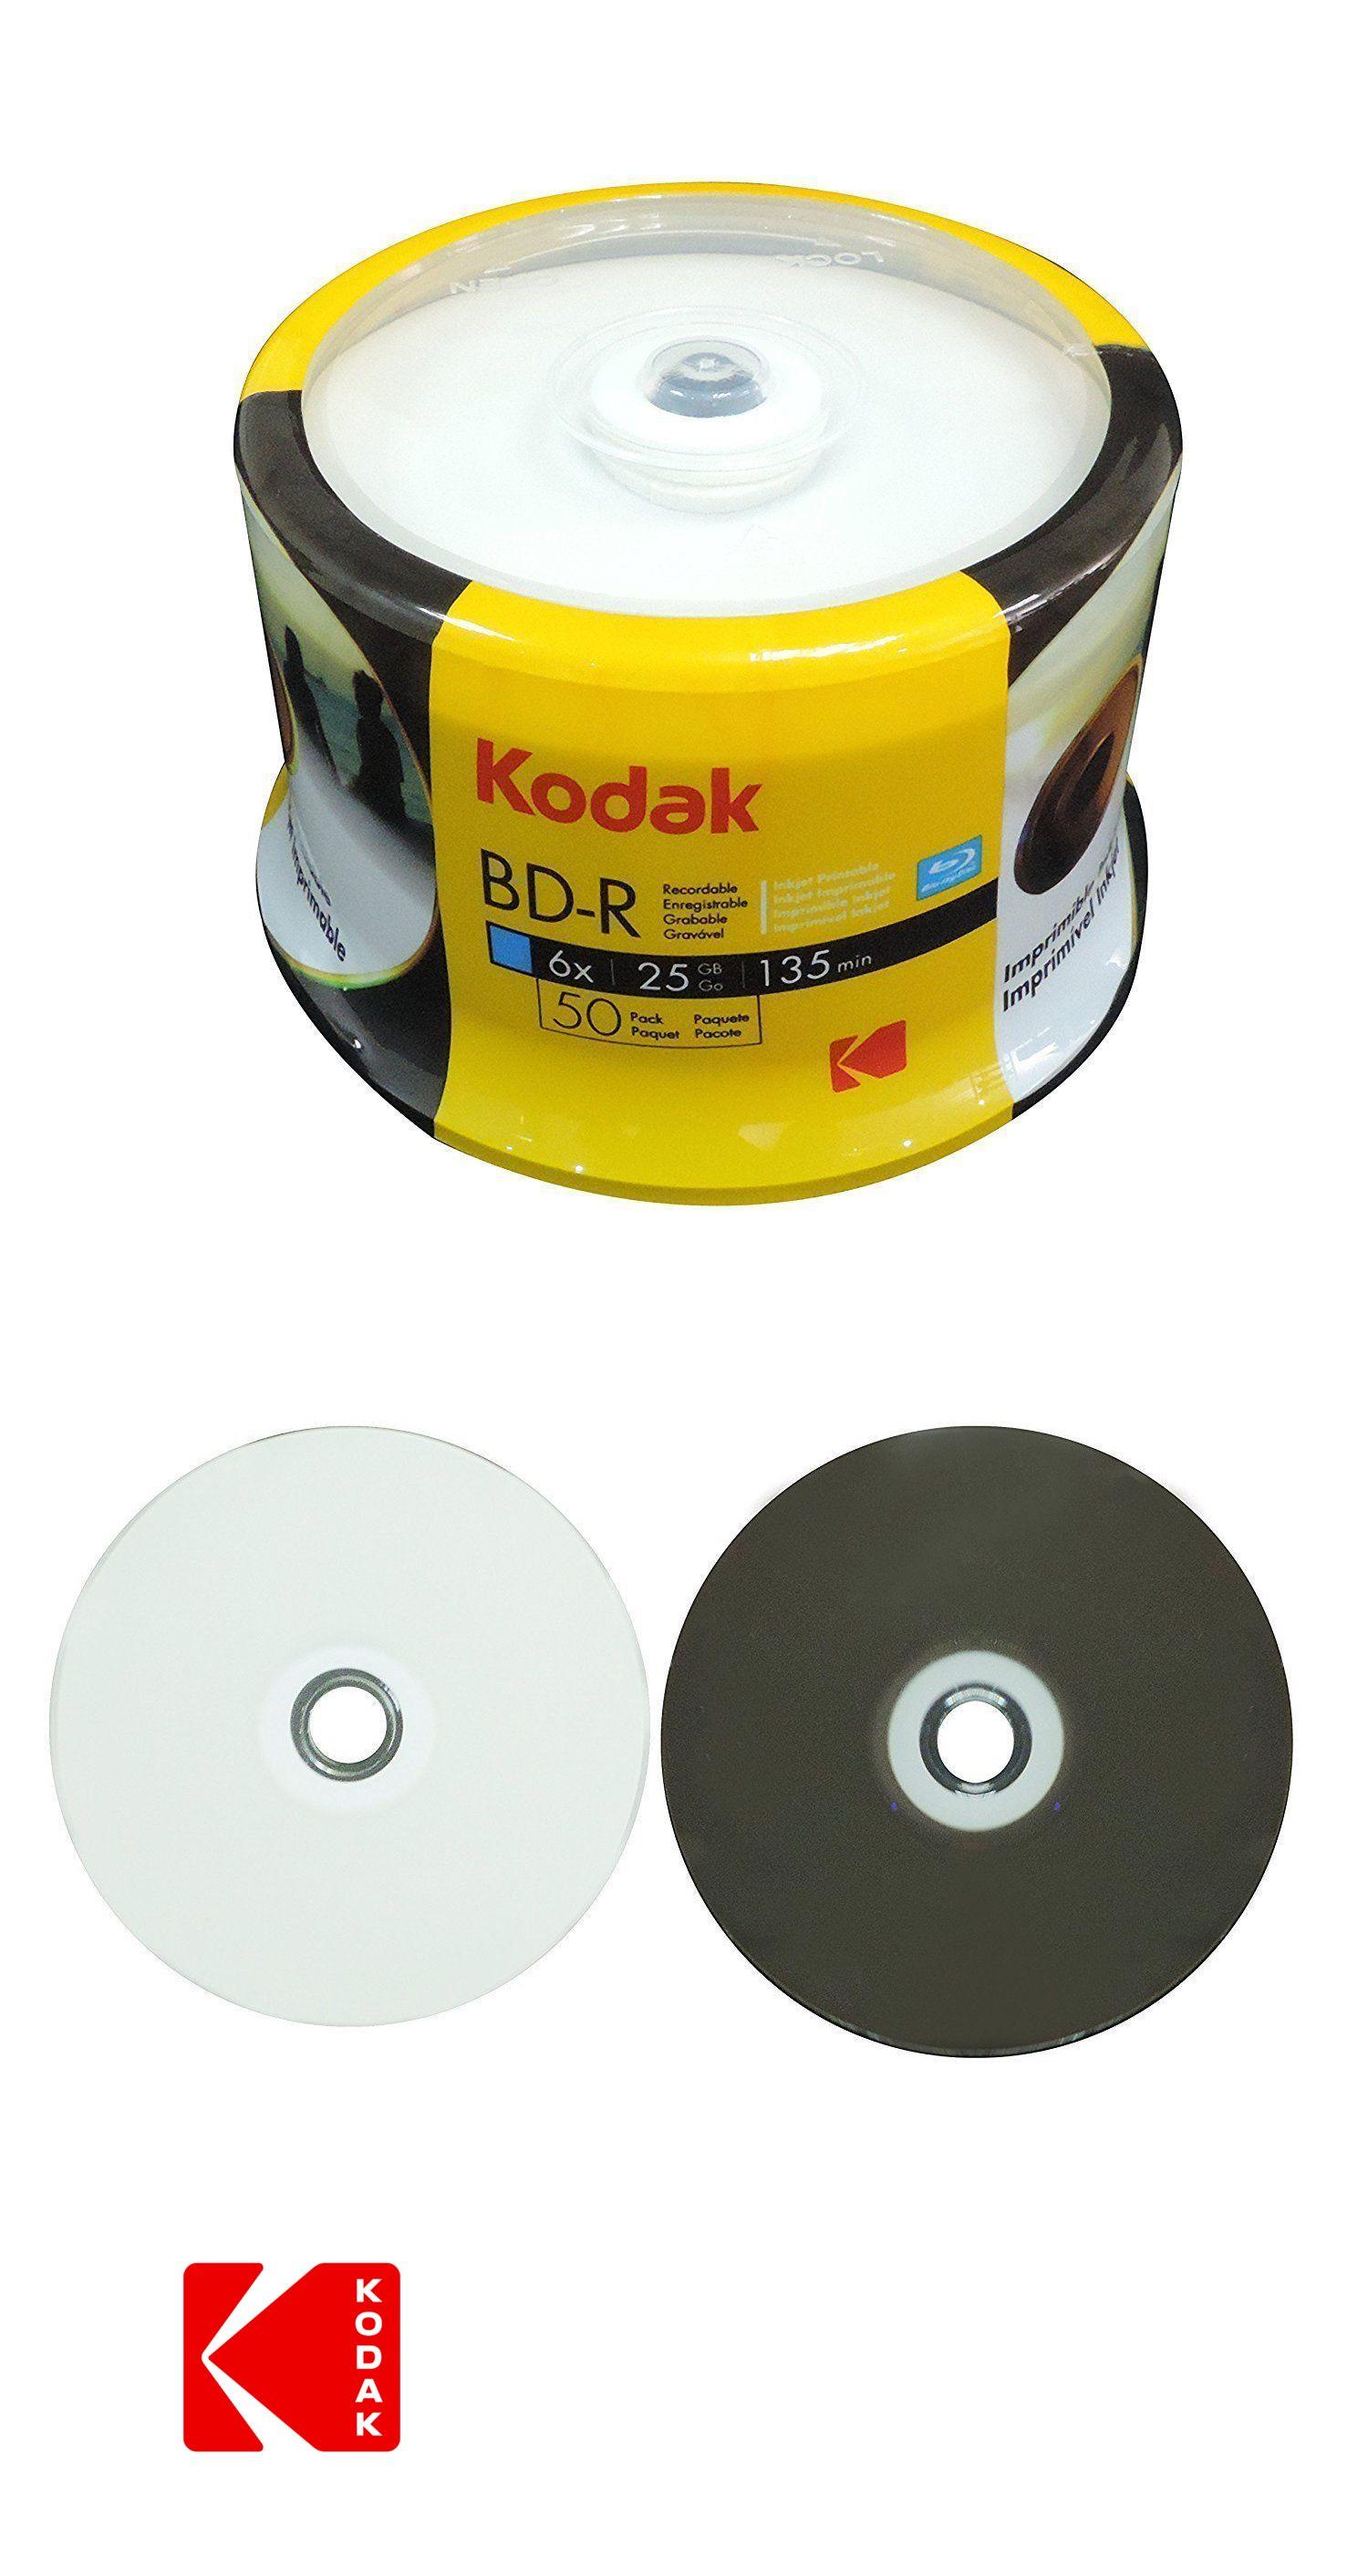 graphic relating to Printable Blu Ray Discs identify CD DVD and Blu-ray Discs 80135: 50 Kodak 6X Blank Bd-R Blu